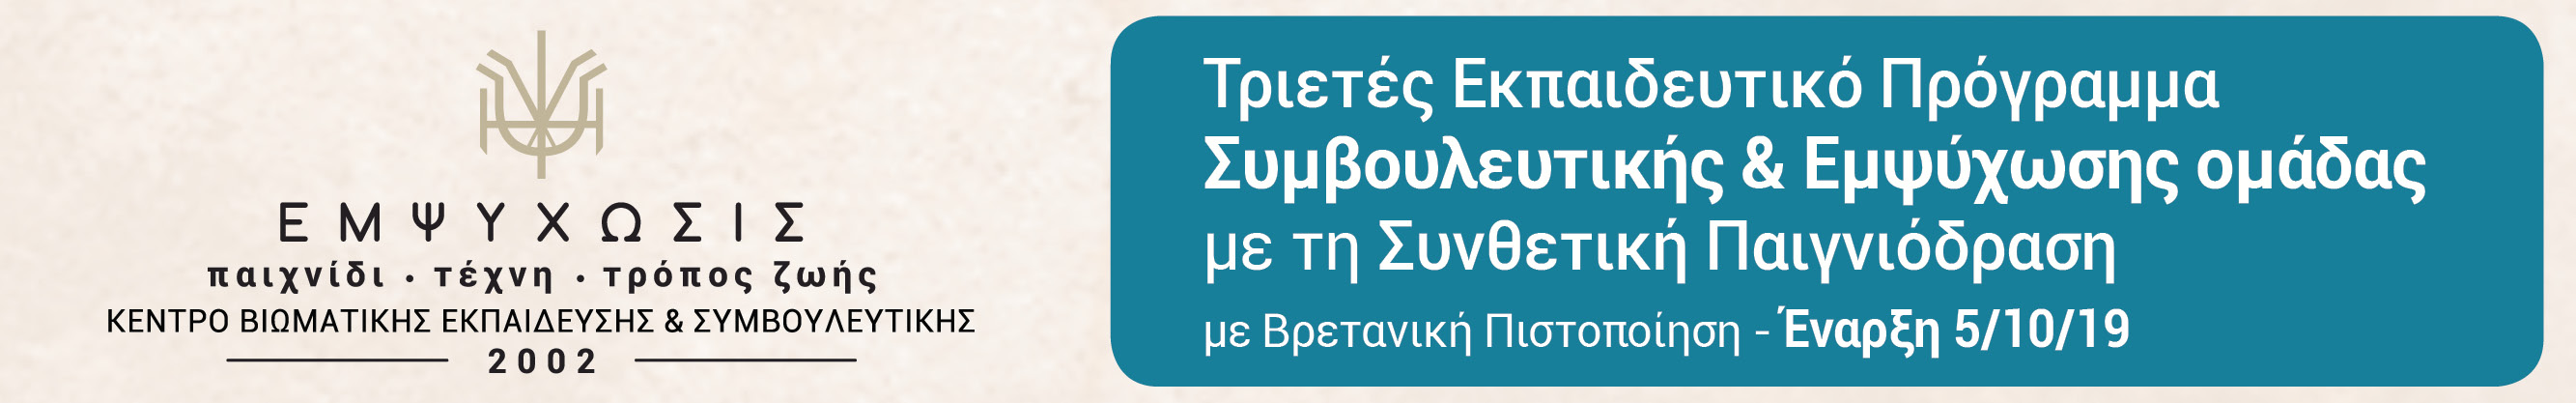 Empsychosis banner front